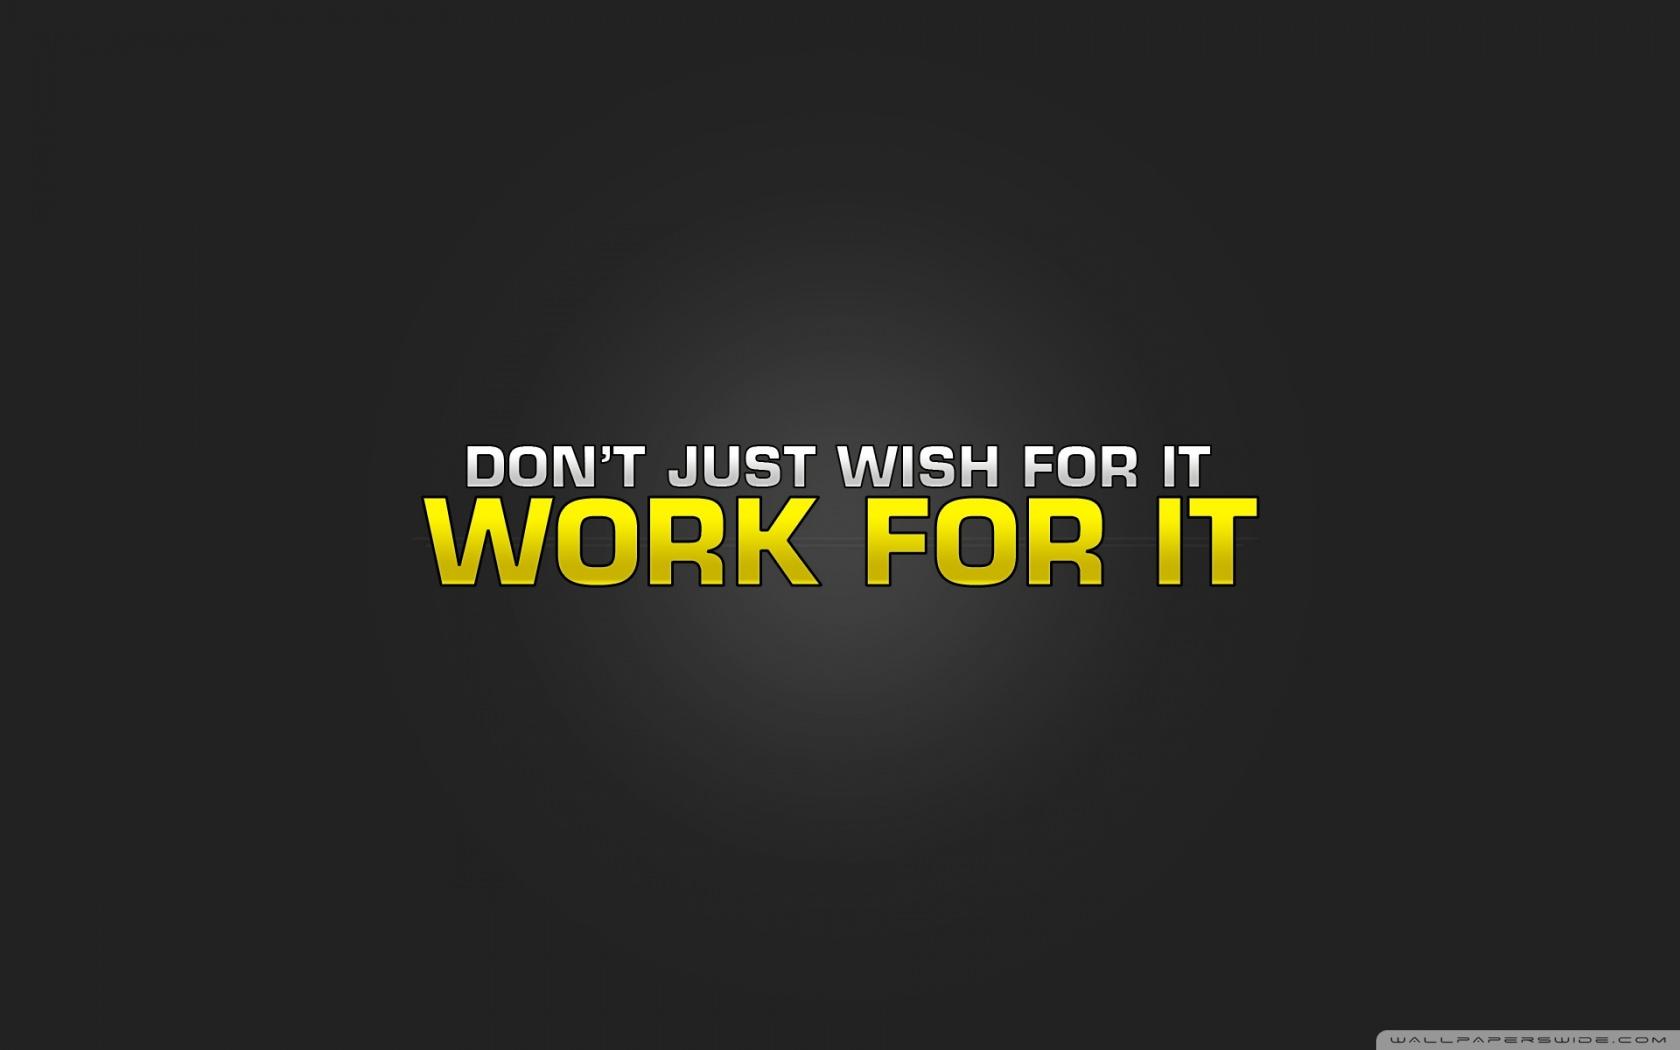 work_is_worship-wallpaper-1680x1050.jpg